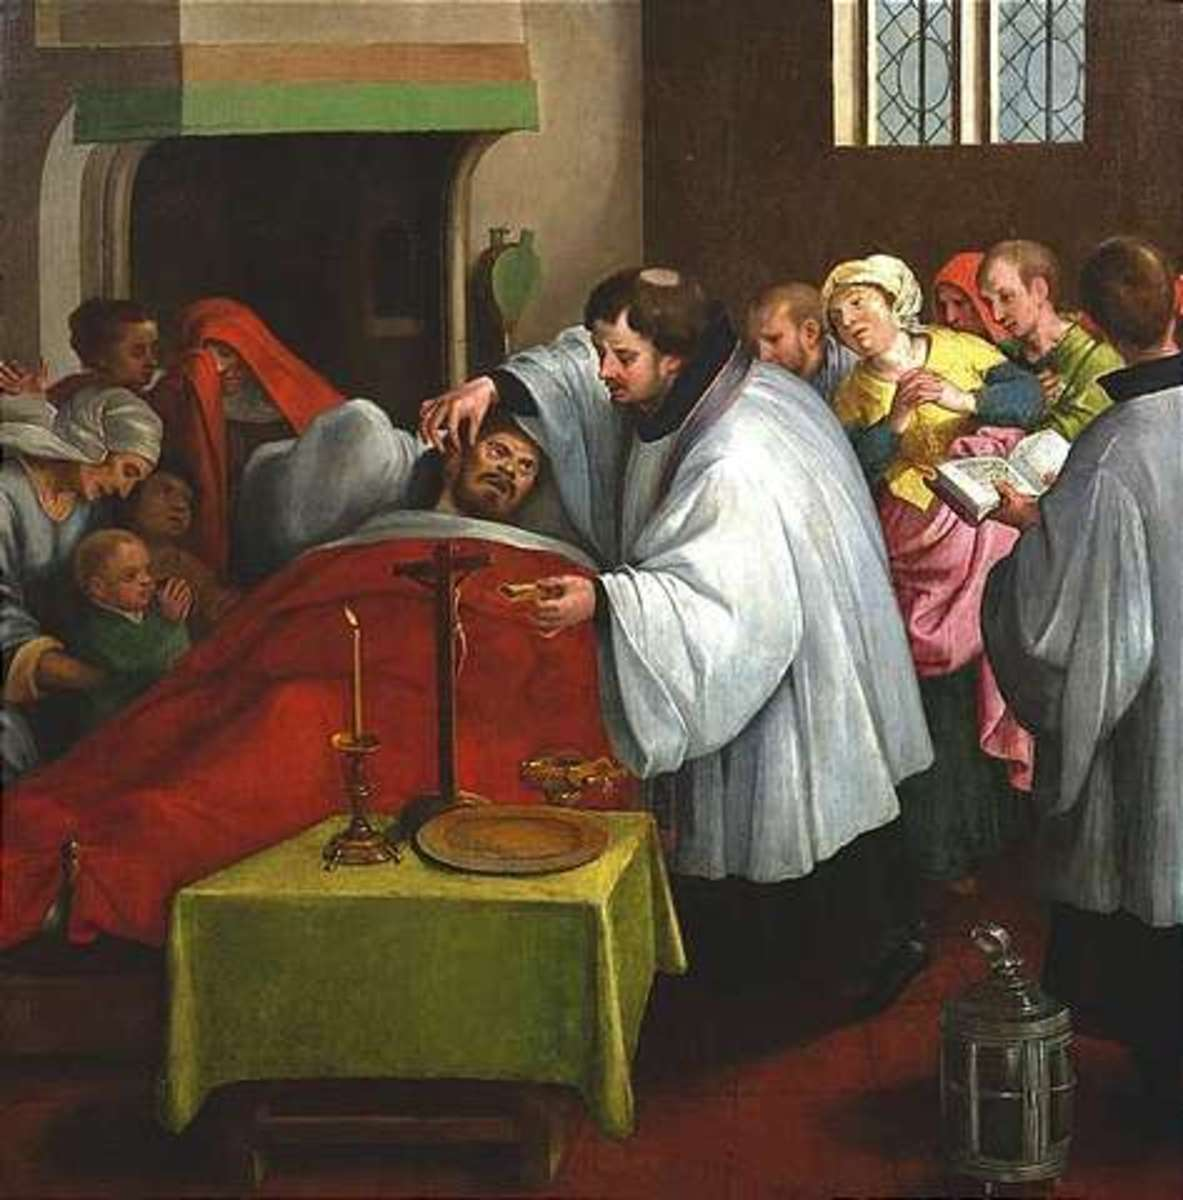 Letzte Ölung, Dutch School, c.1600: Last Rites Oil on wood, 92 x 90 cm